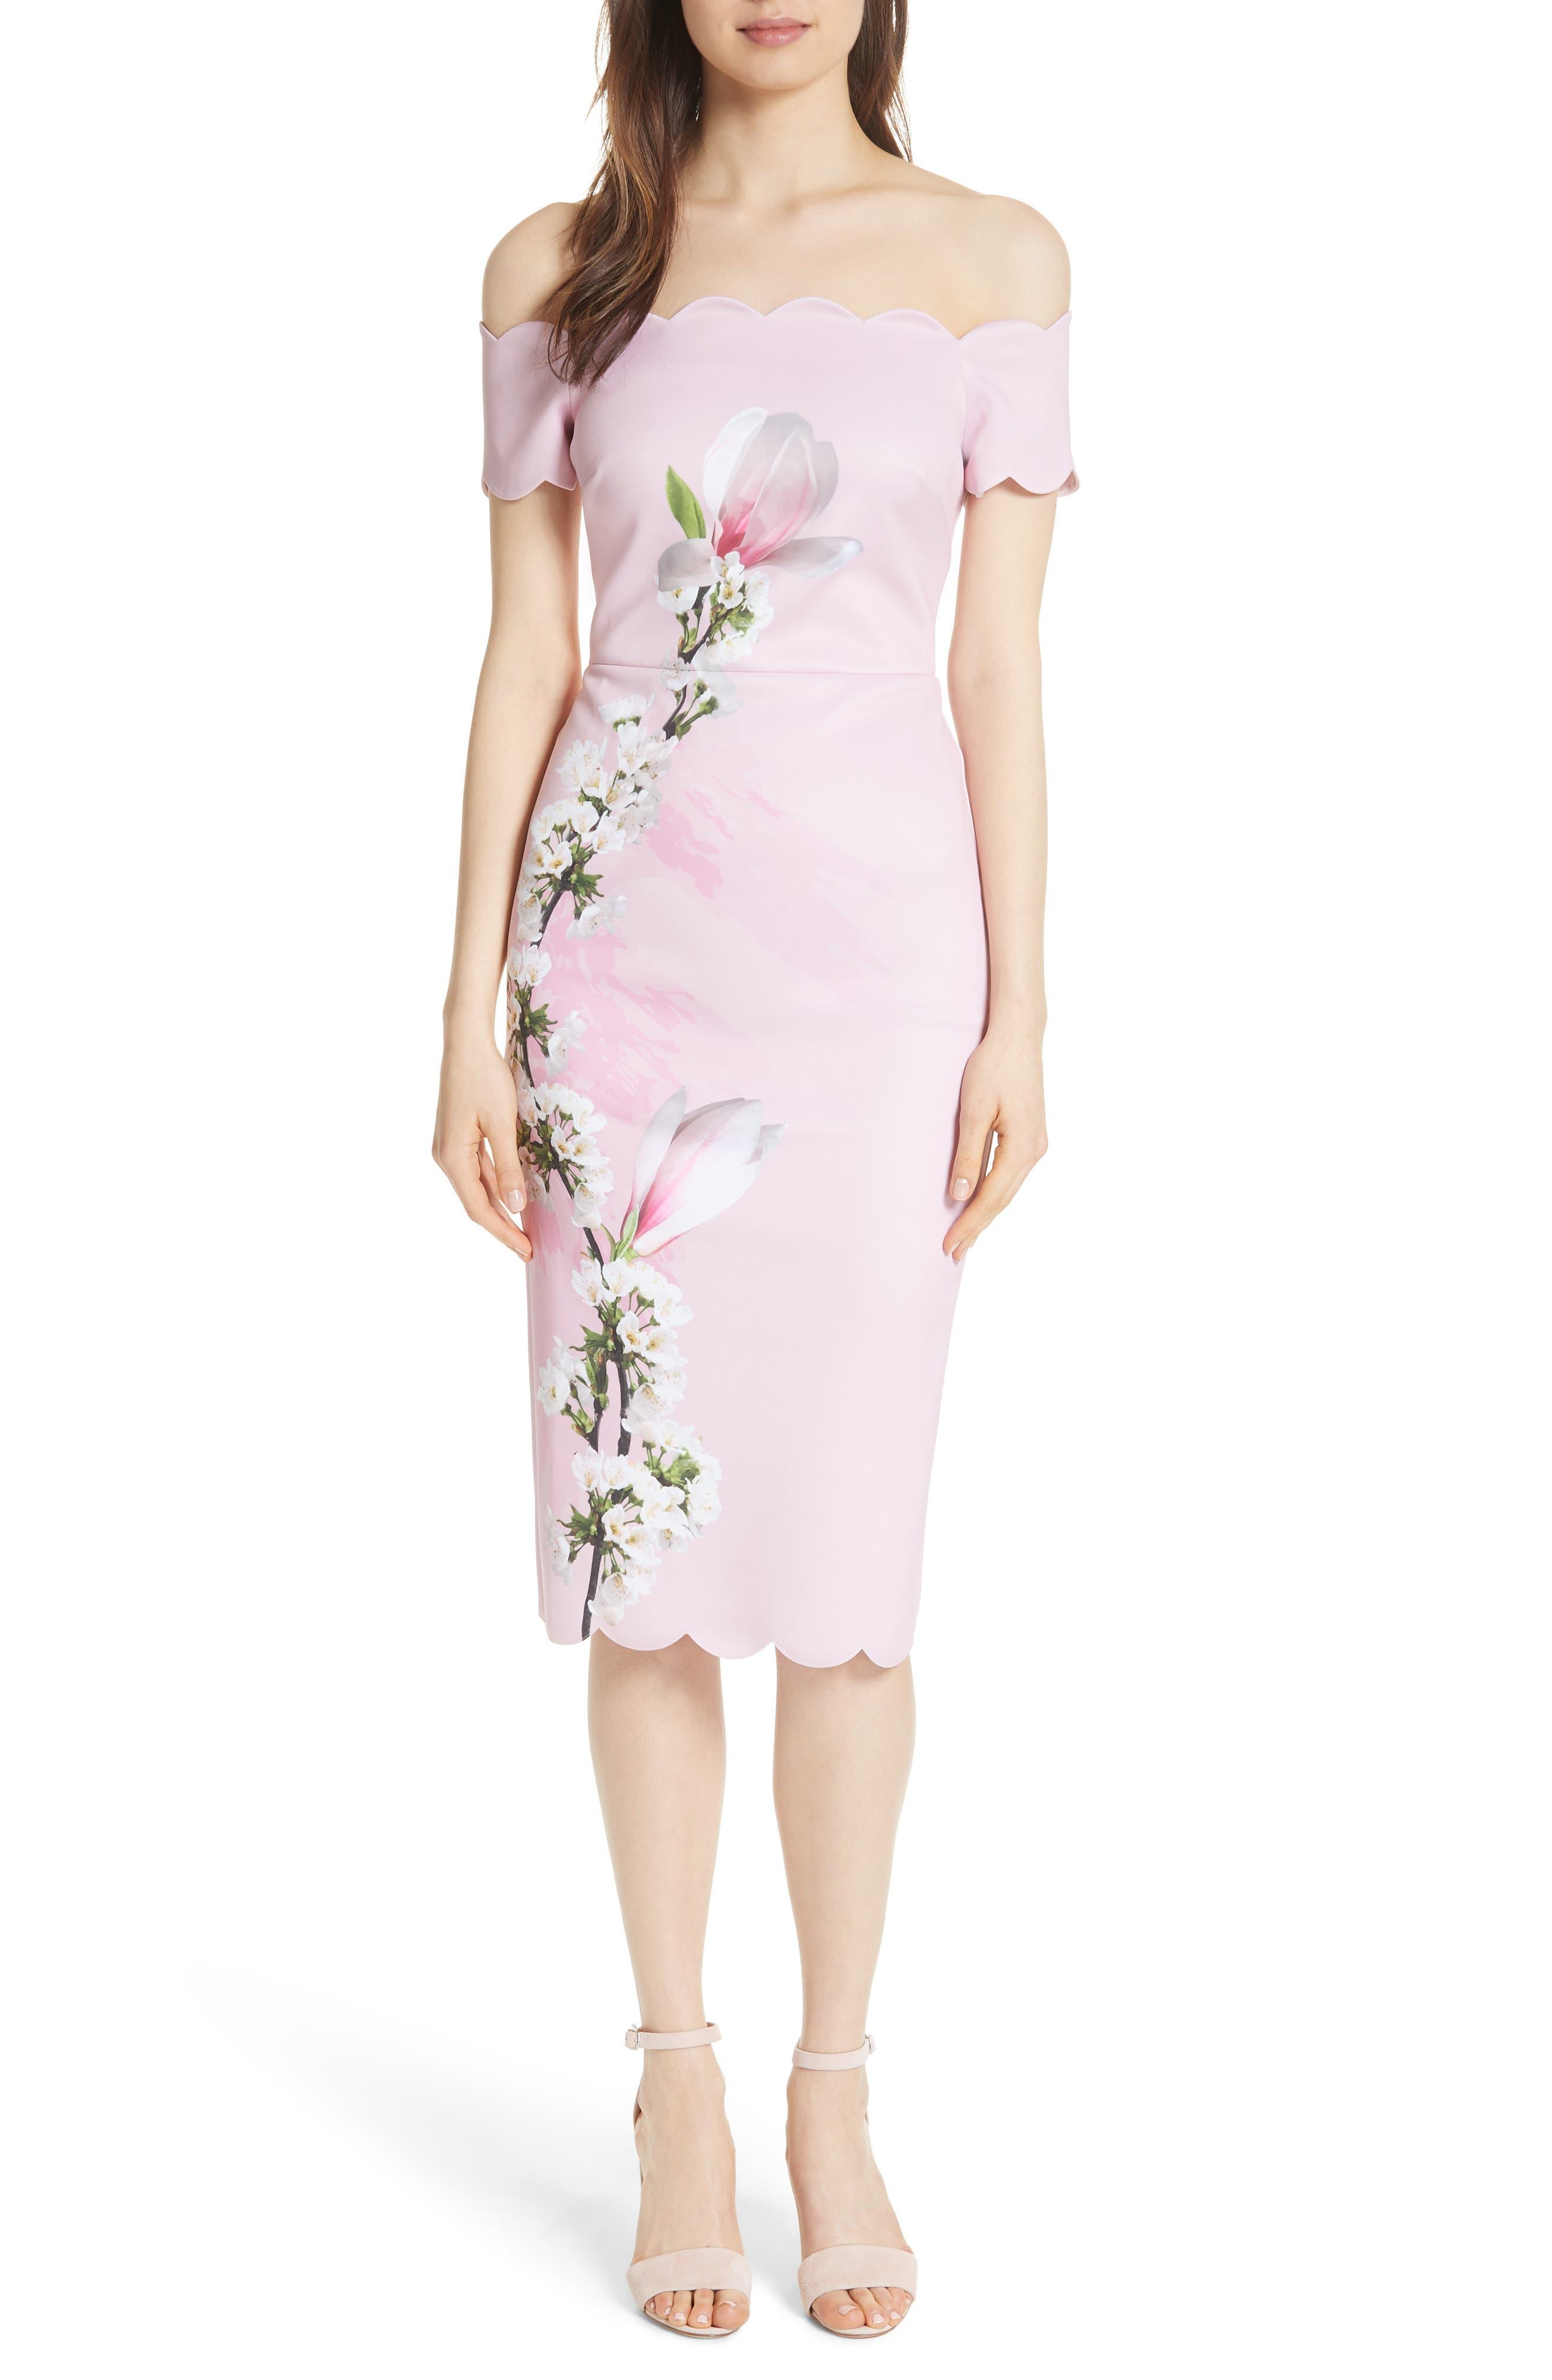 Olyva Harmony Body-Con Dress,                             Main thumbnail 1, color,                             PALE PINK